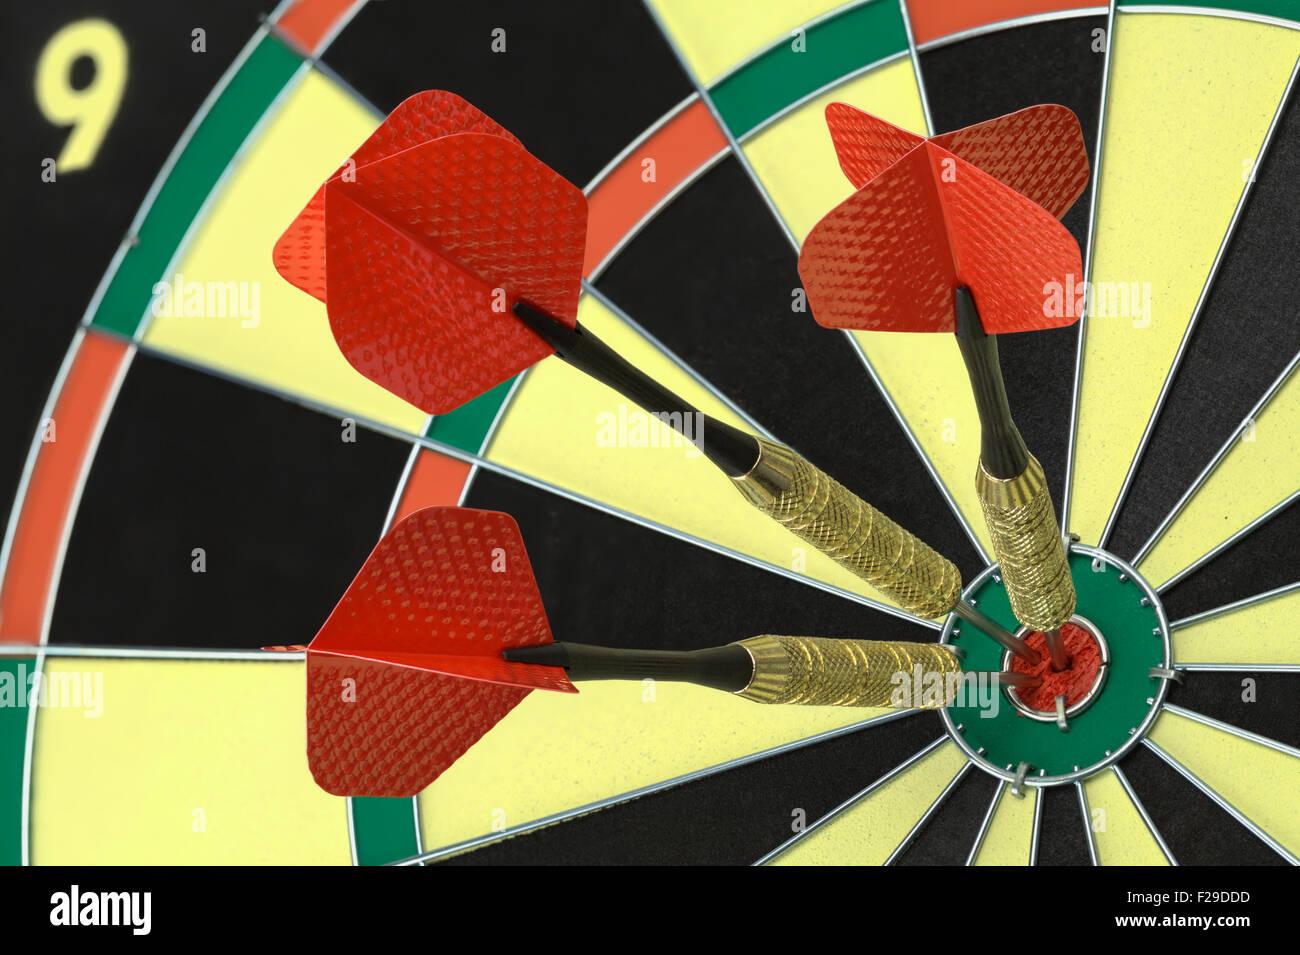 Three Darts in the Bulls Eye on Dart Board. - Stock Image